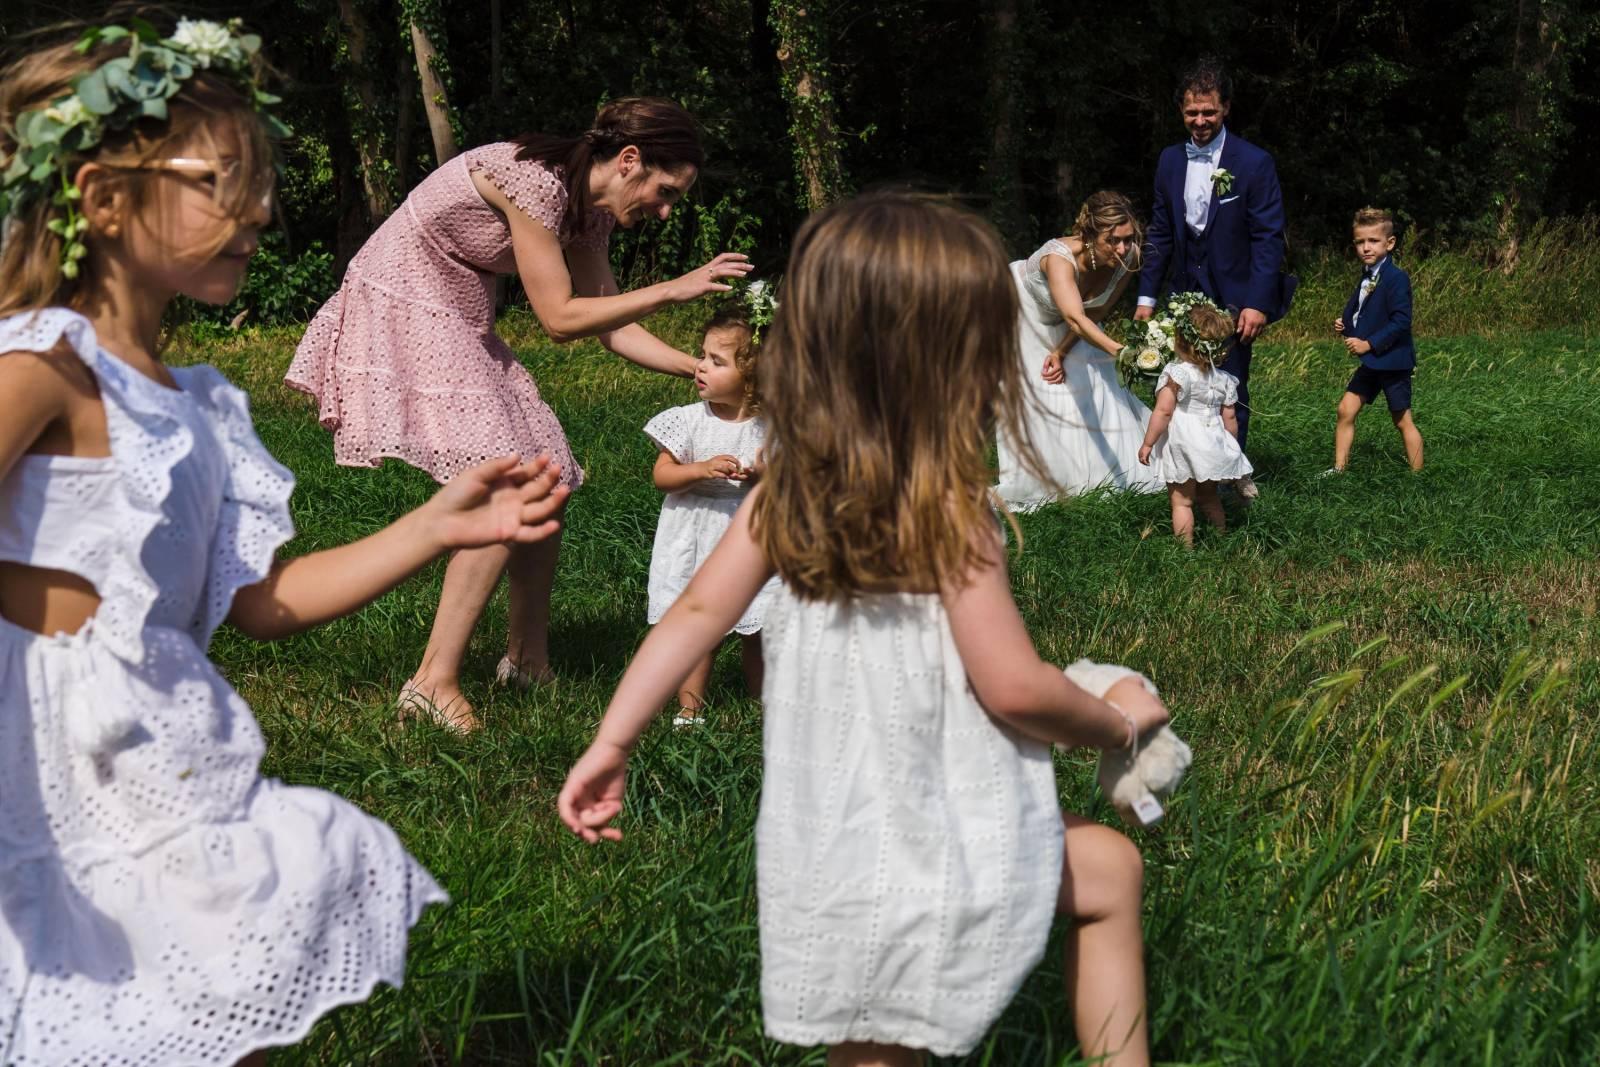 Philippe Swiggers - huwelijksfotograaf - House of Weddings - 6